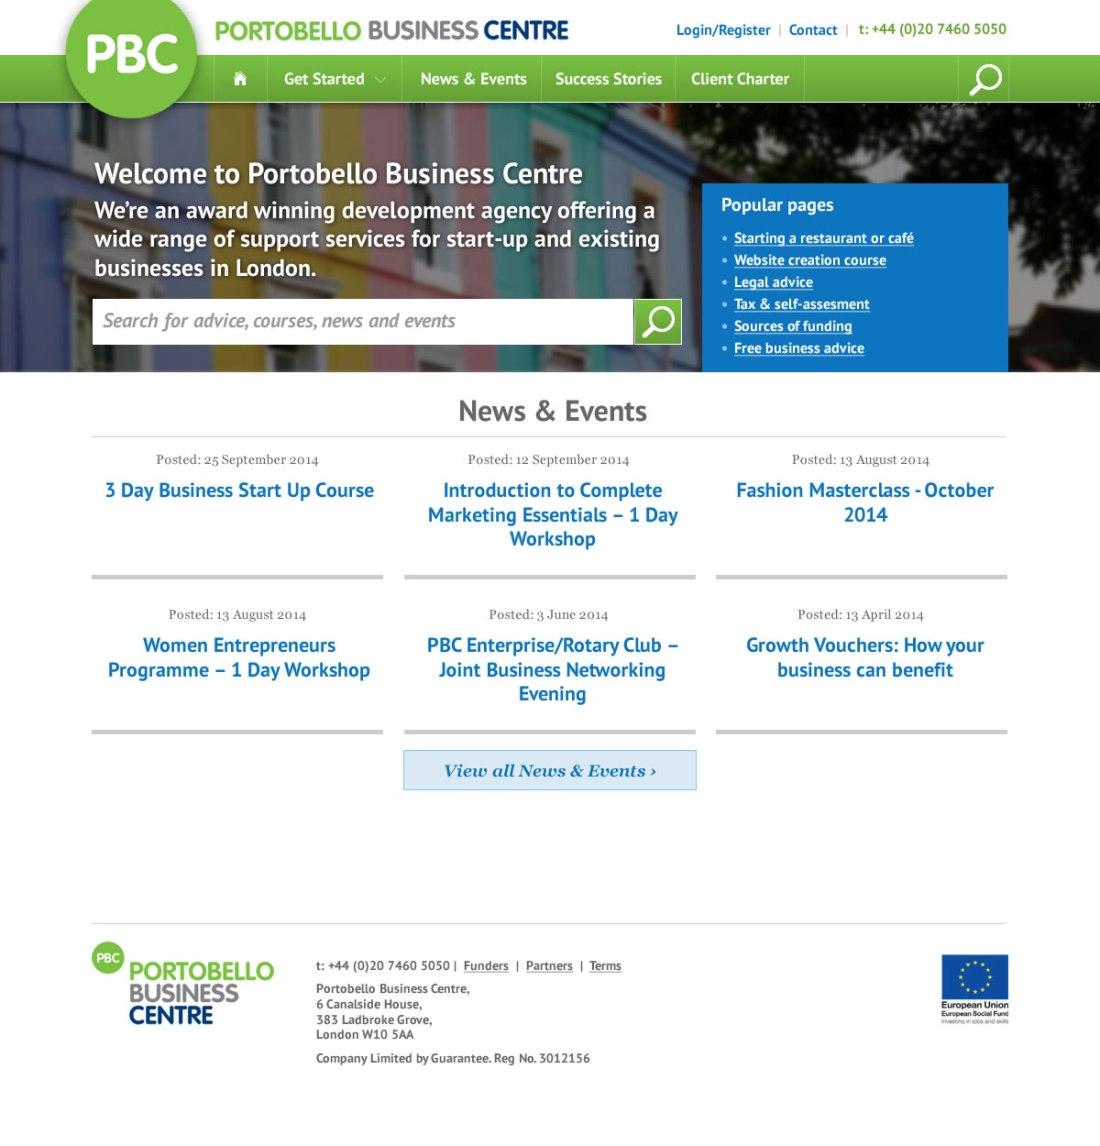 Website design for the Portobello Business Centre